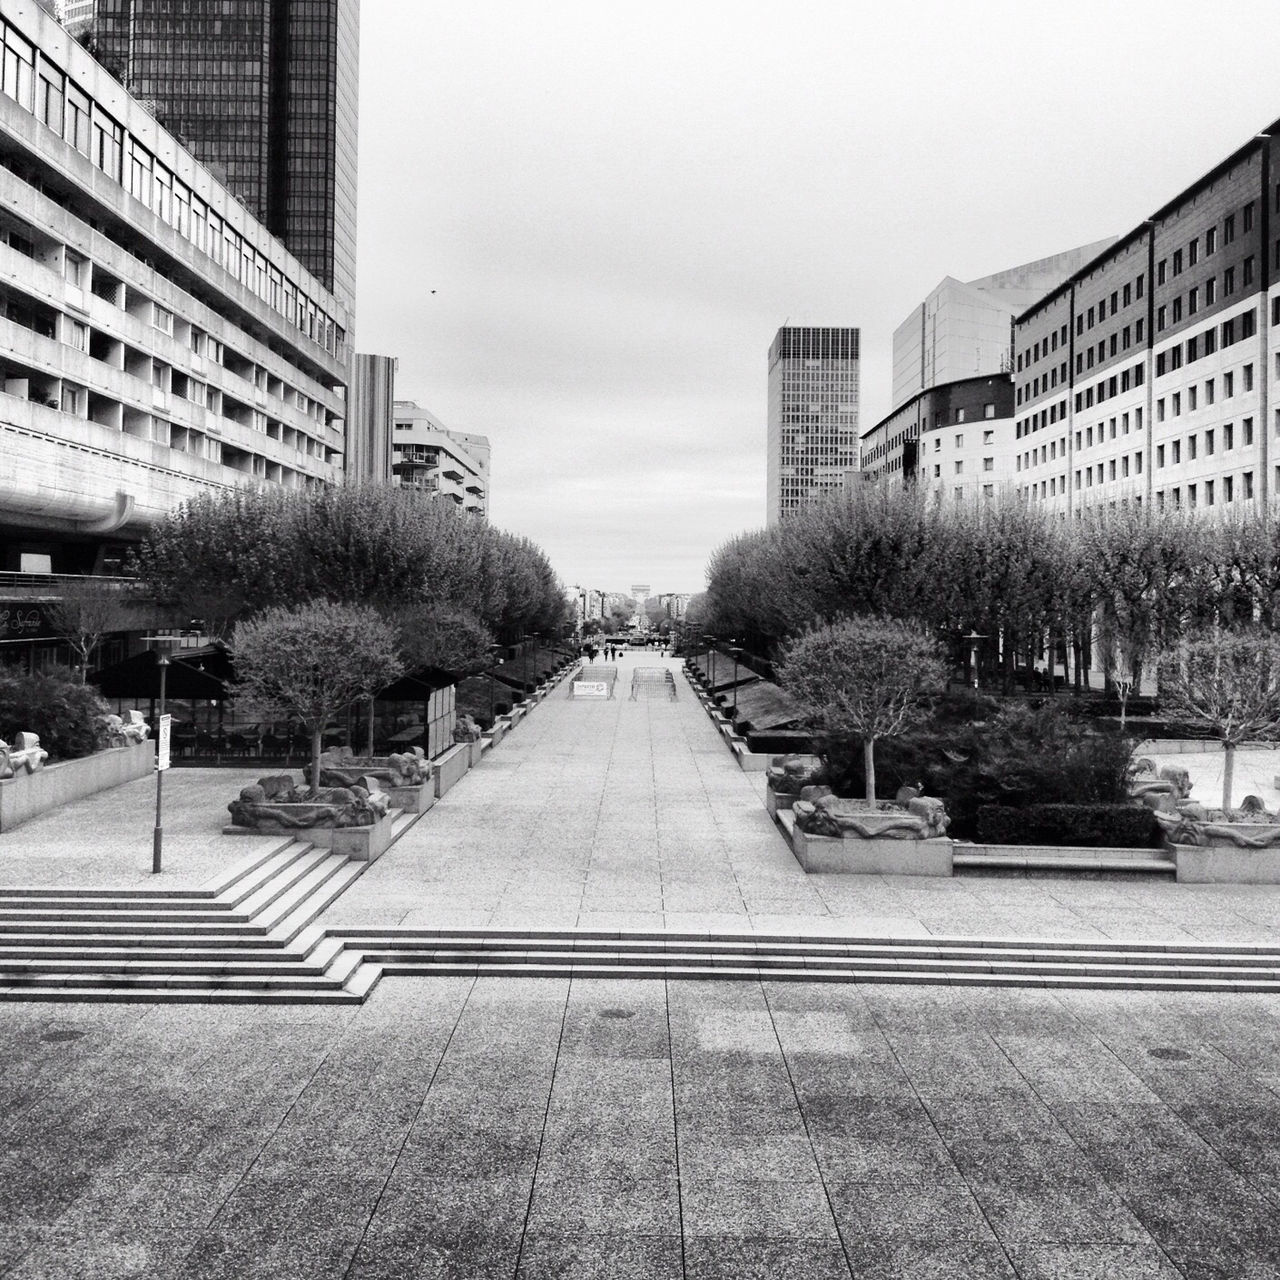 Beautiful stock photos of schwarz weiß, architecture, building exterior, built structure, city